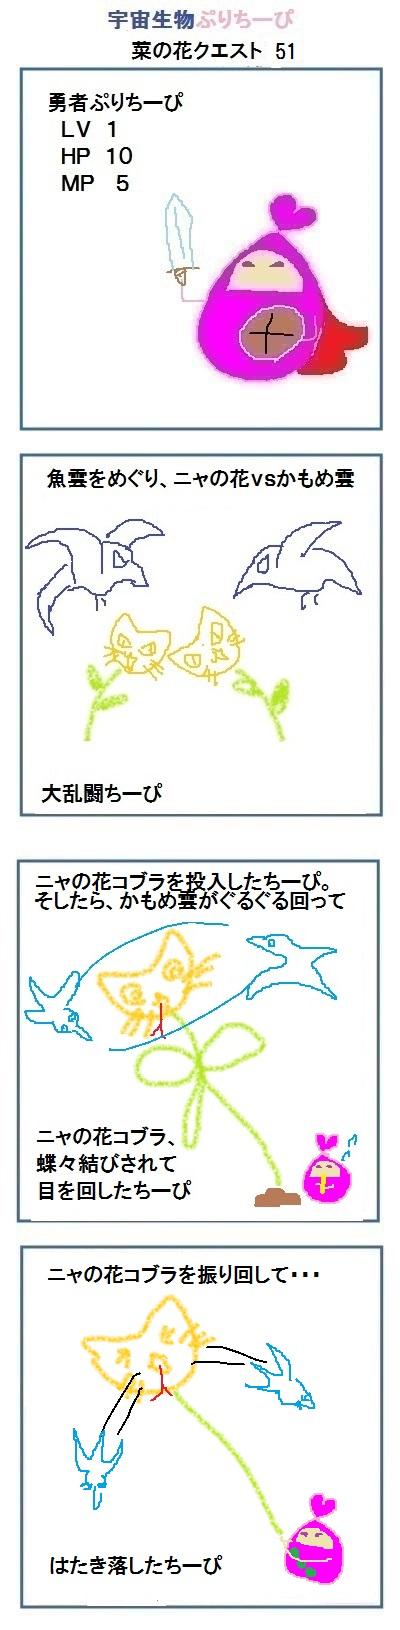 160522_nanohana_quest51.jpg